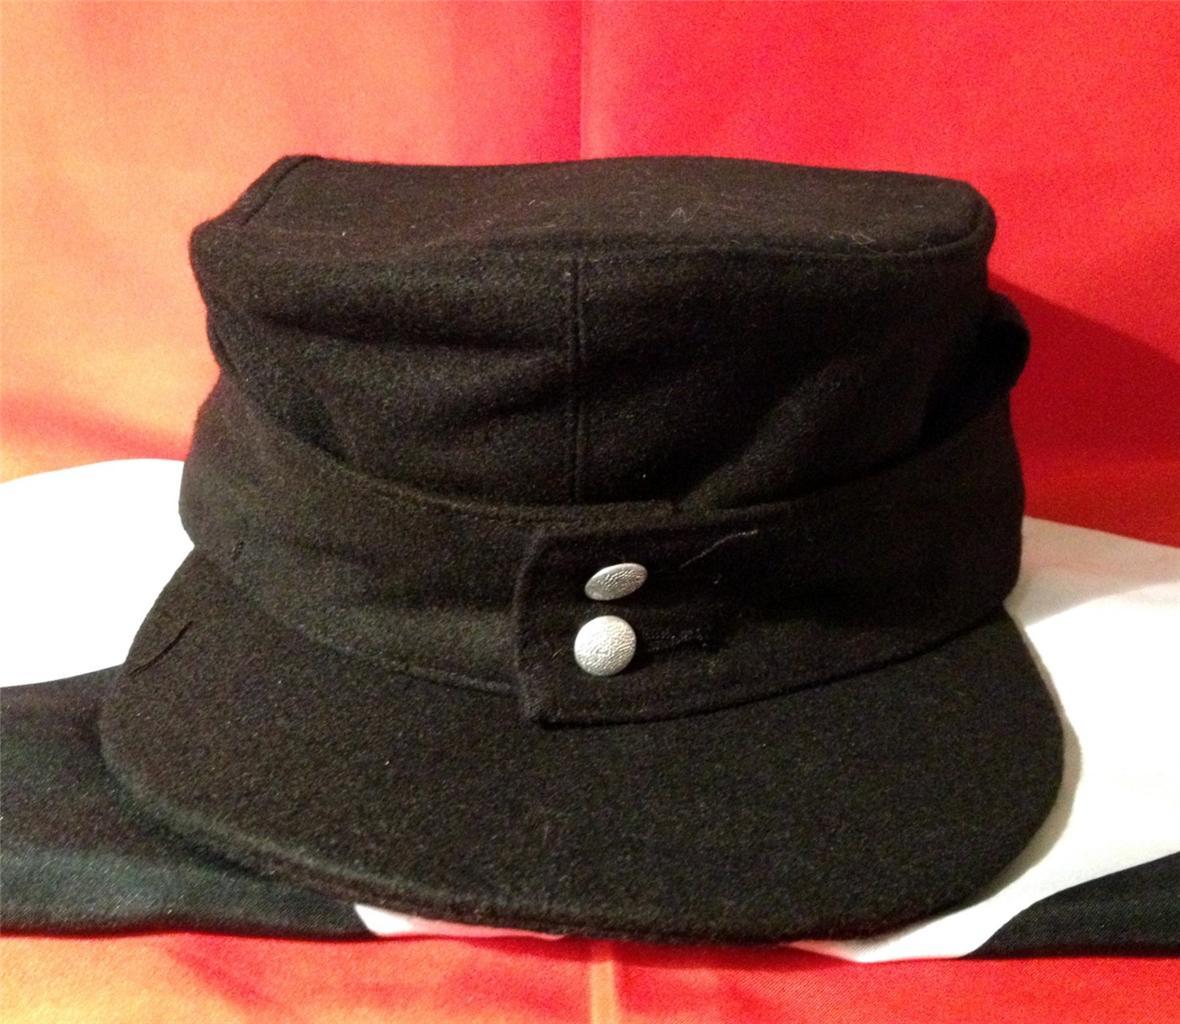 471c015d ... Ww2 Field Caps: WW2 German Panzer M43 Ski Cap Military Army Field Hat